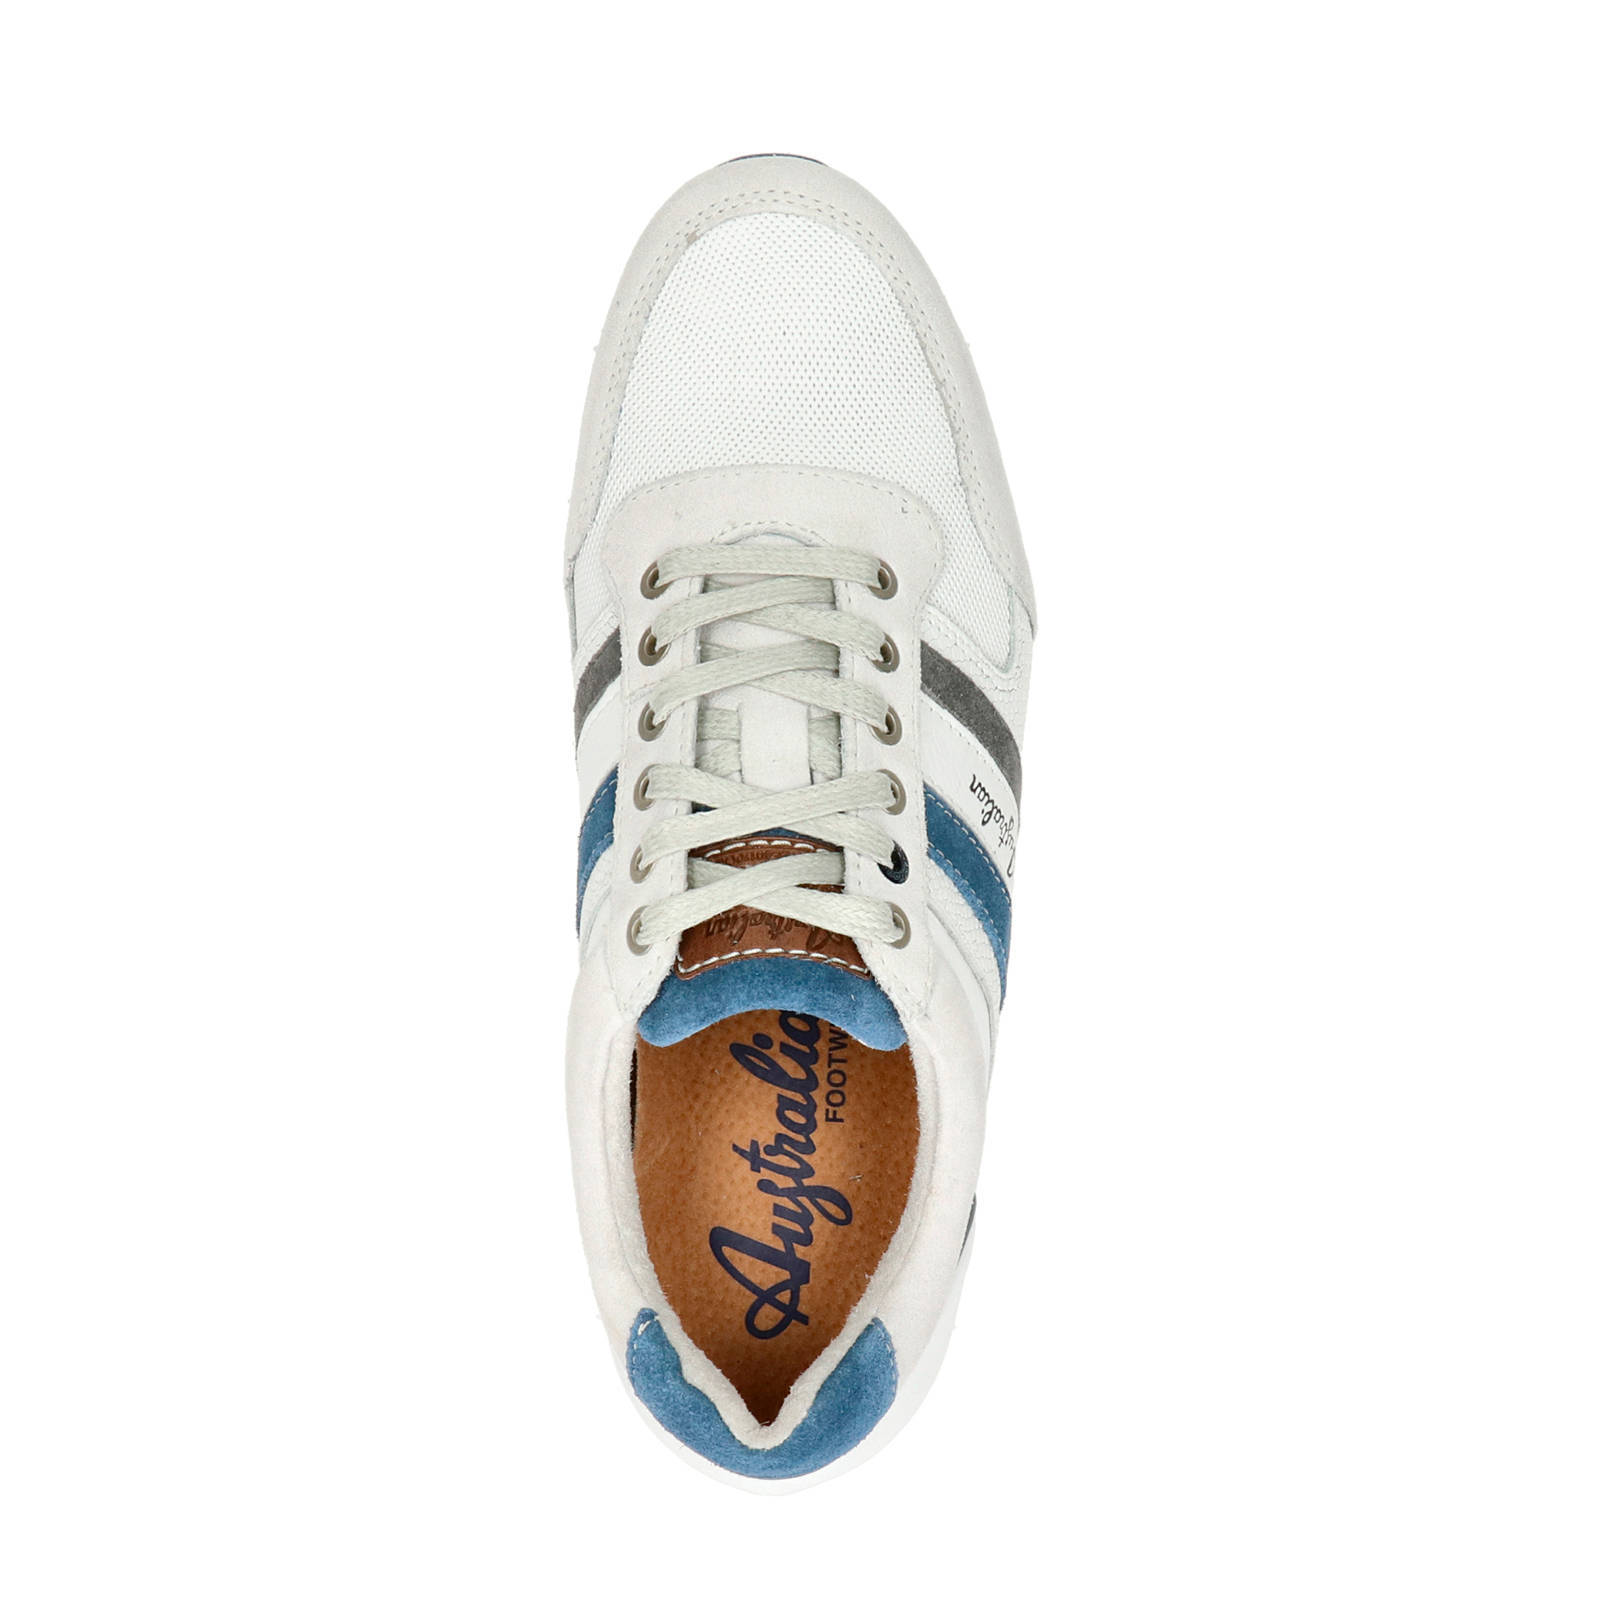 8857f308e australian-cornwell-leren-sneakers-met-strepen-wit-wit-8719796153068.jpg